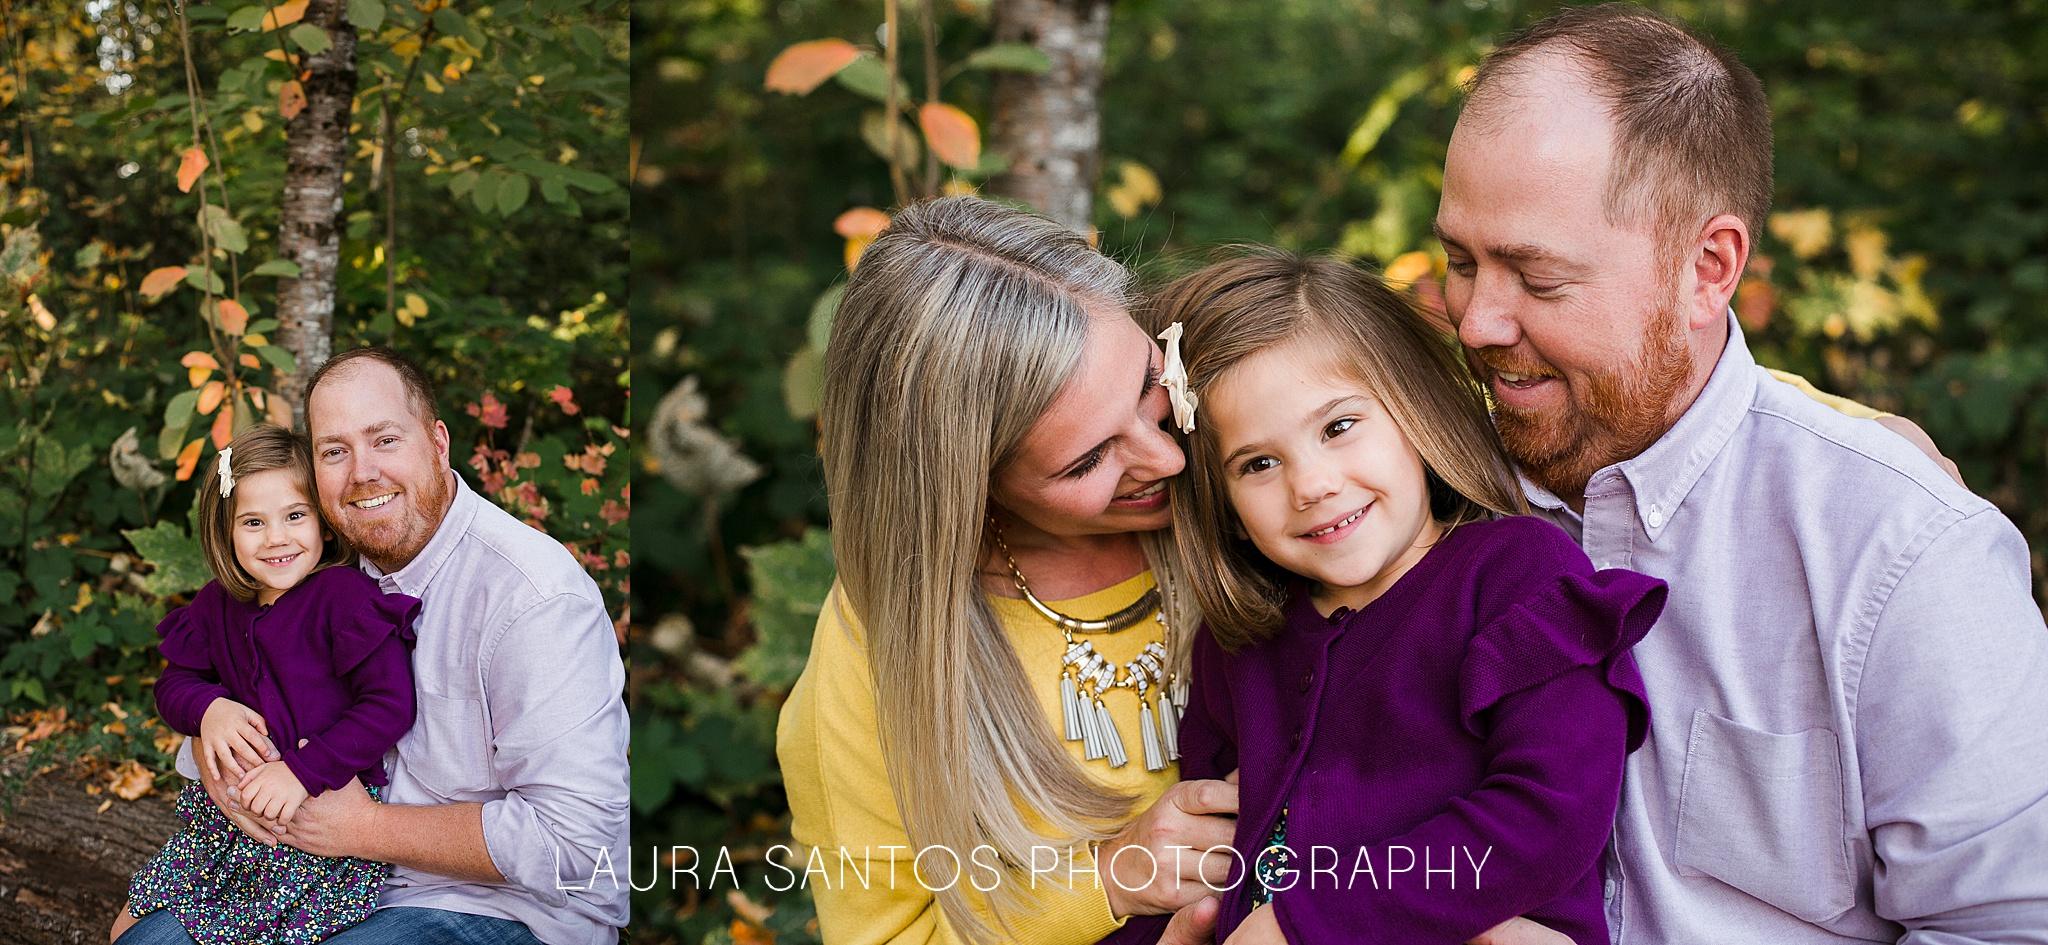 Laura Santos Photography Portland Oregon Family Photographer_0852.jpg